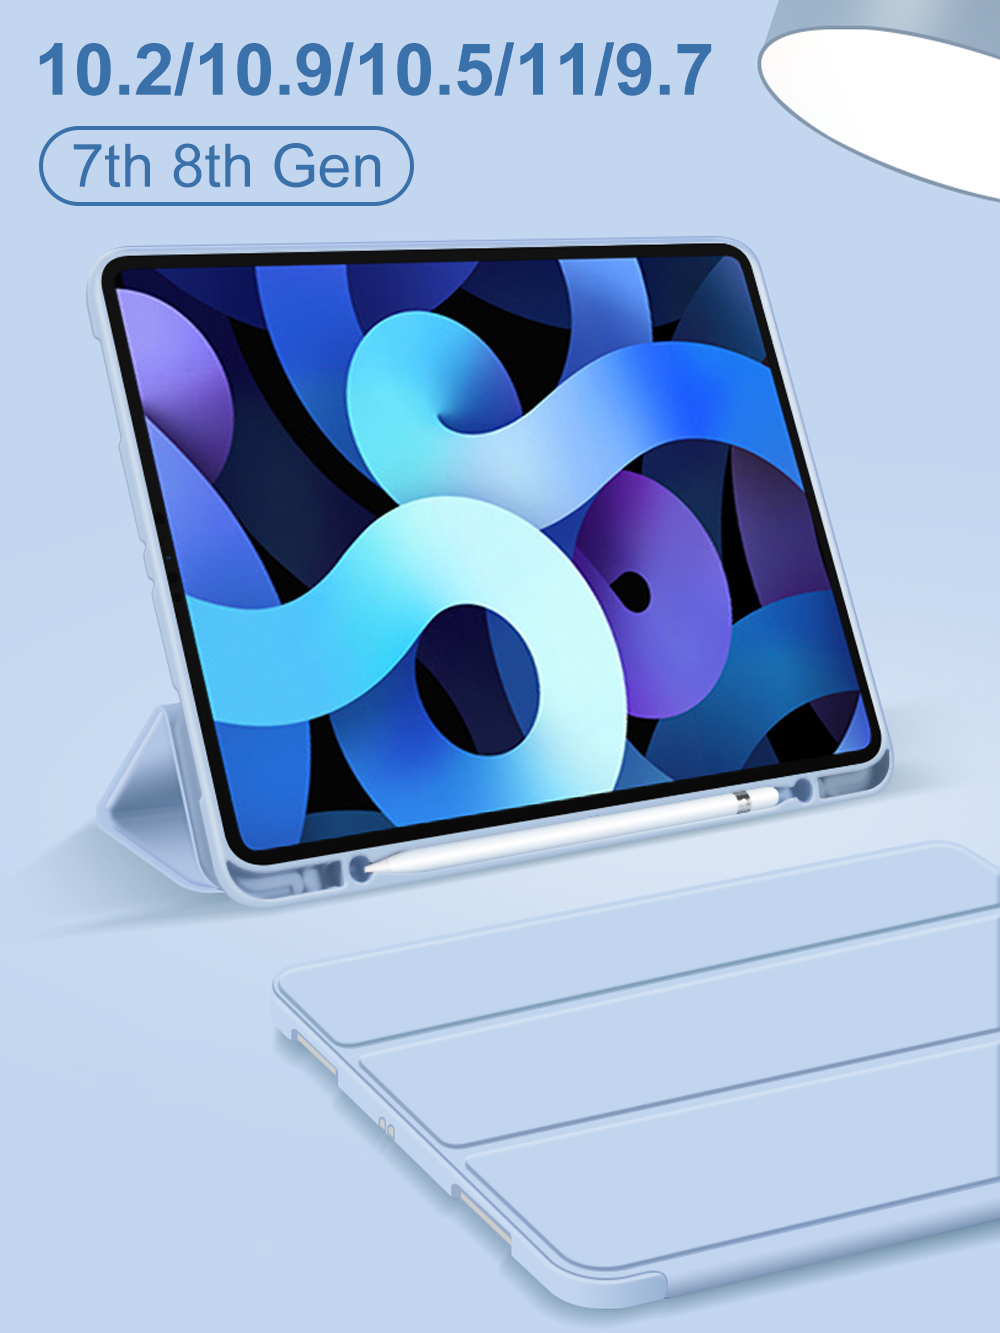 For iPad Air 4 iPad Pro 11 2020 10.2 Case for iPad 7th 8th Generation Case Air 2020 2018 9.7 Air 4 10.9 Mini 5 Case Funda Capa